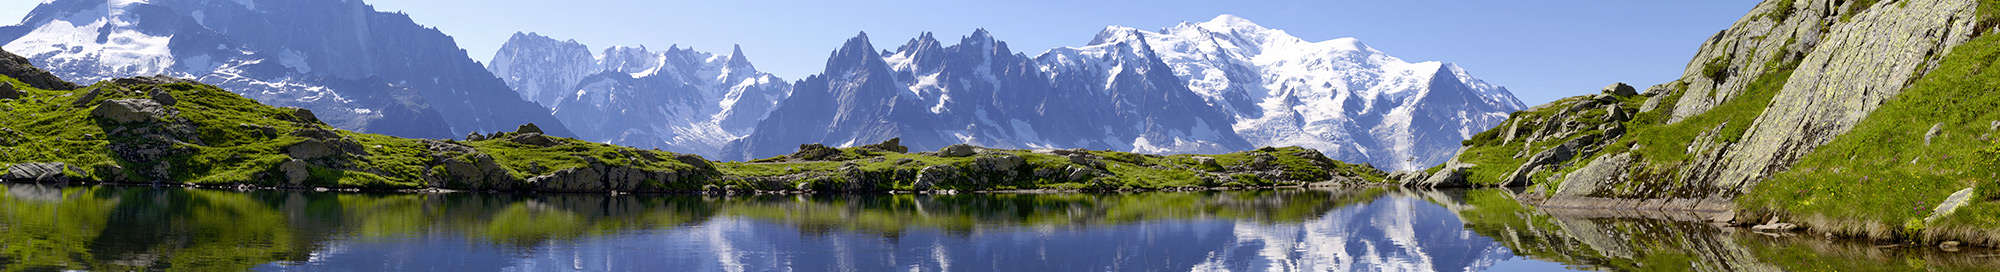 Escapadas fin de semana en Chamonix-Mont-Blanc